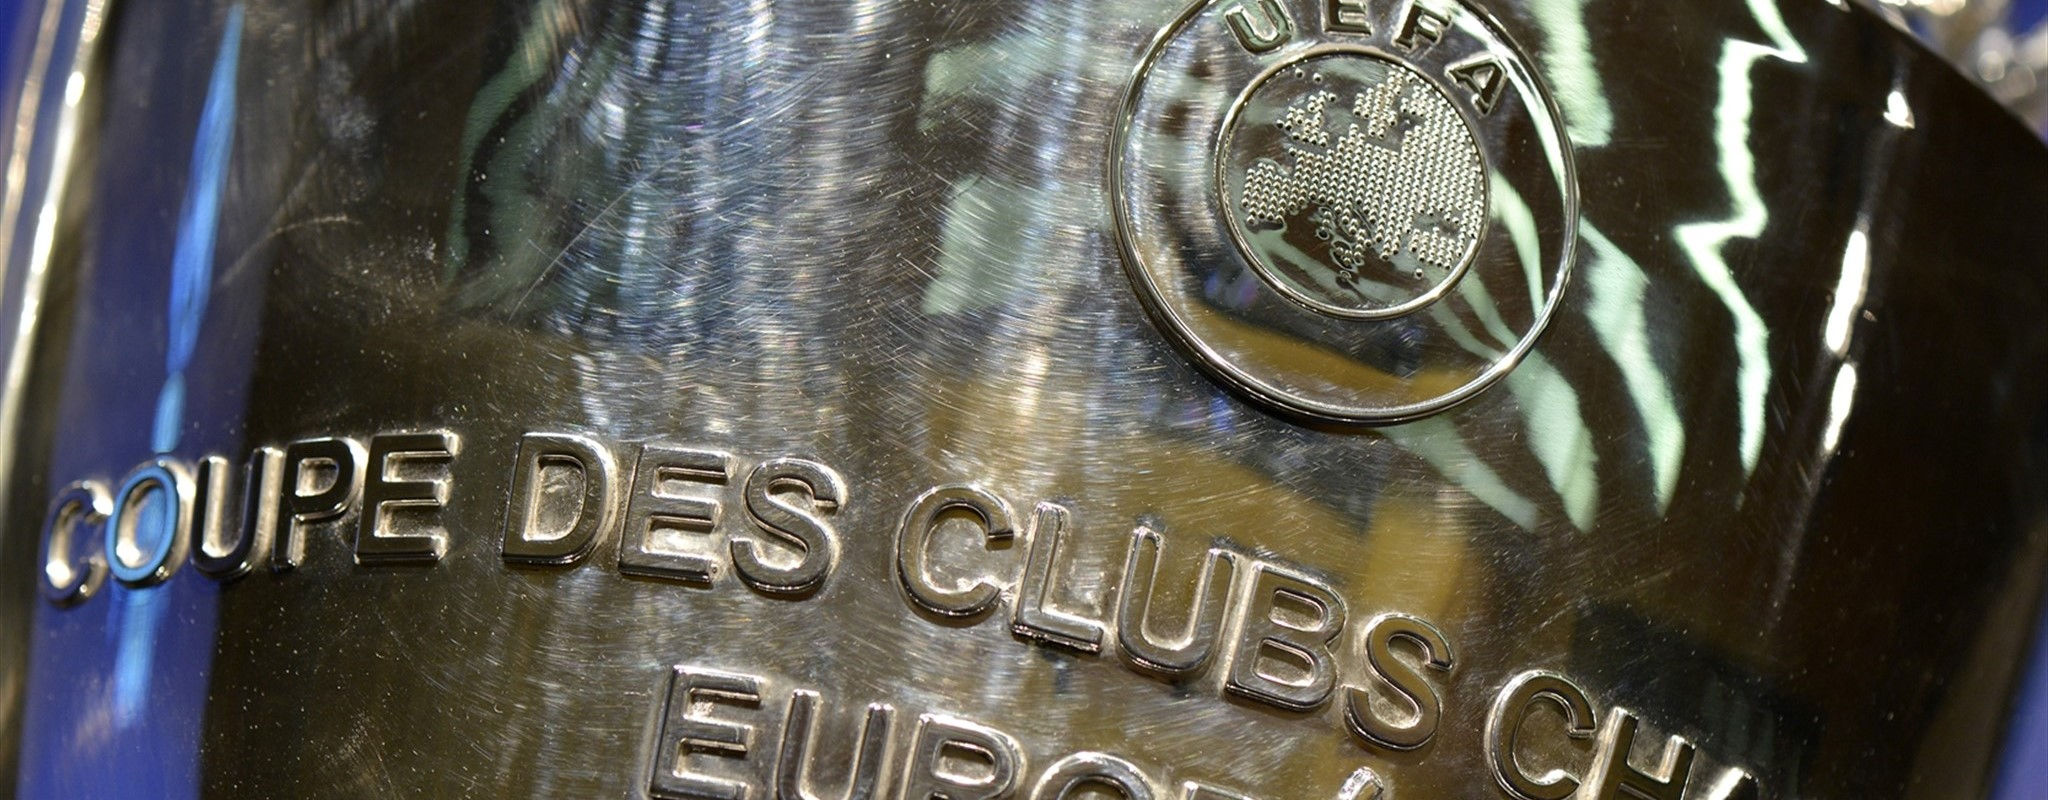 UEFA Champions League Winners